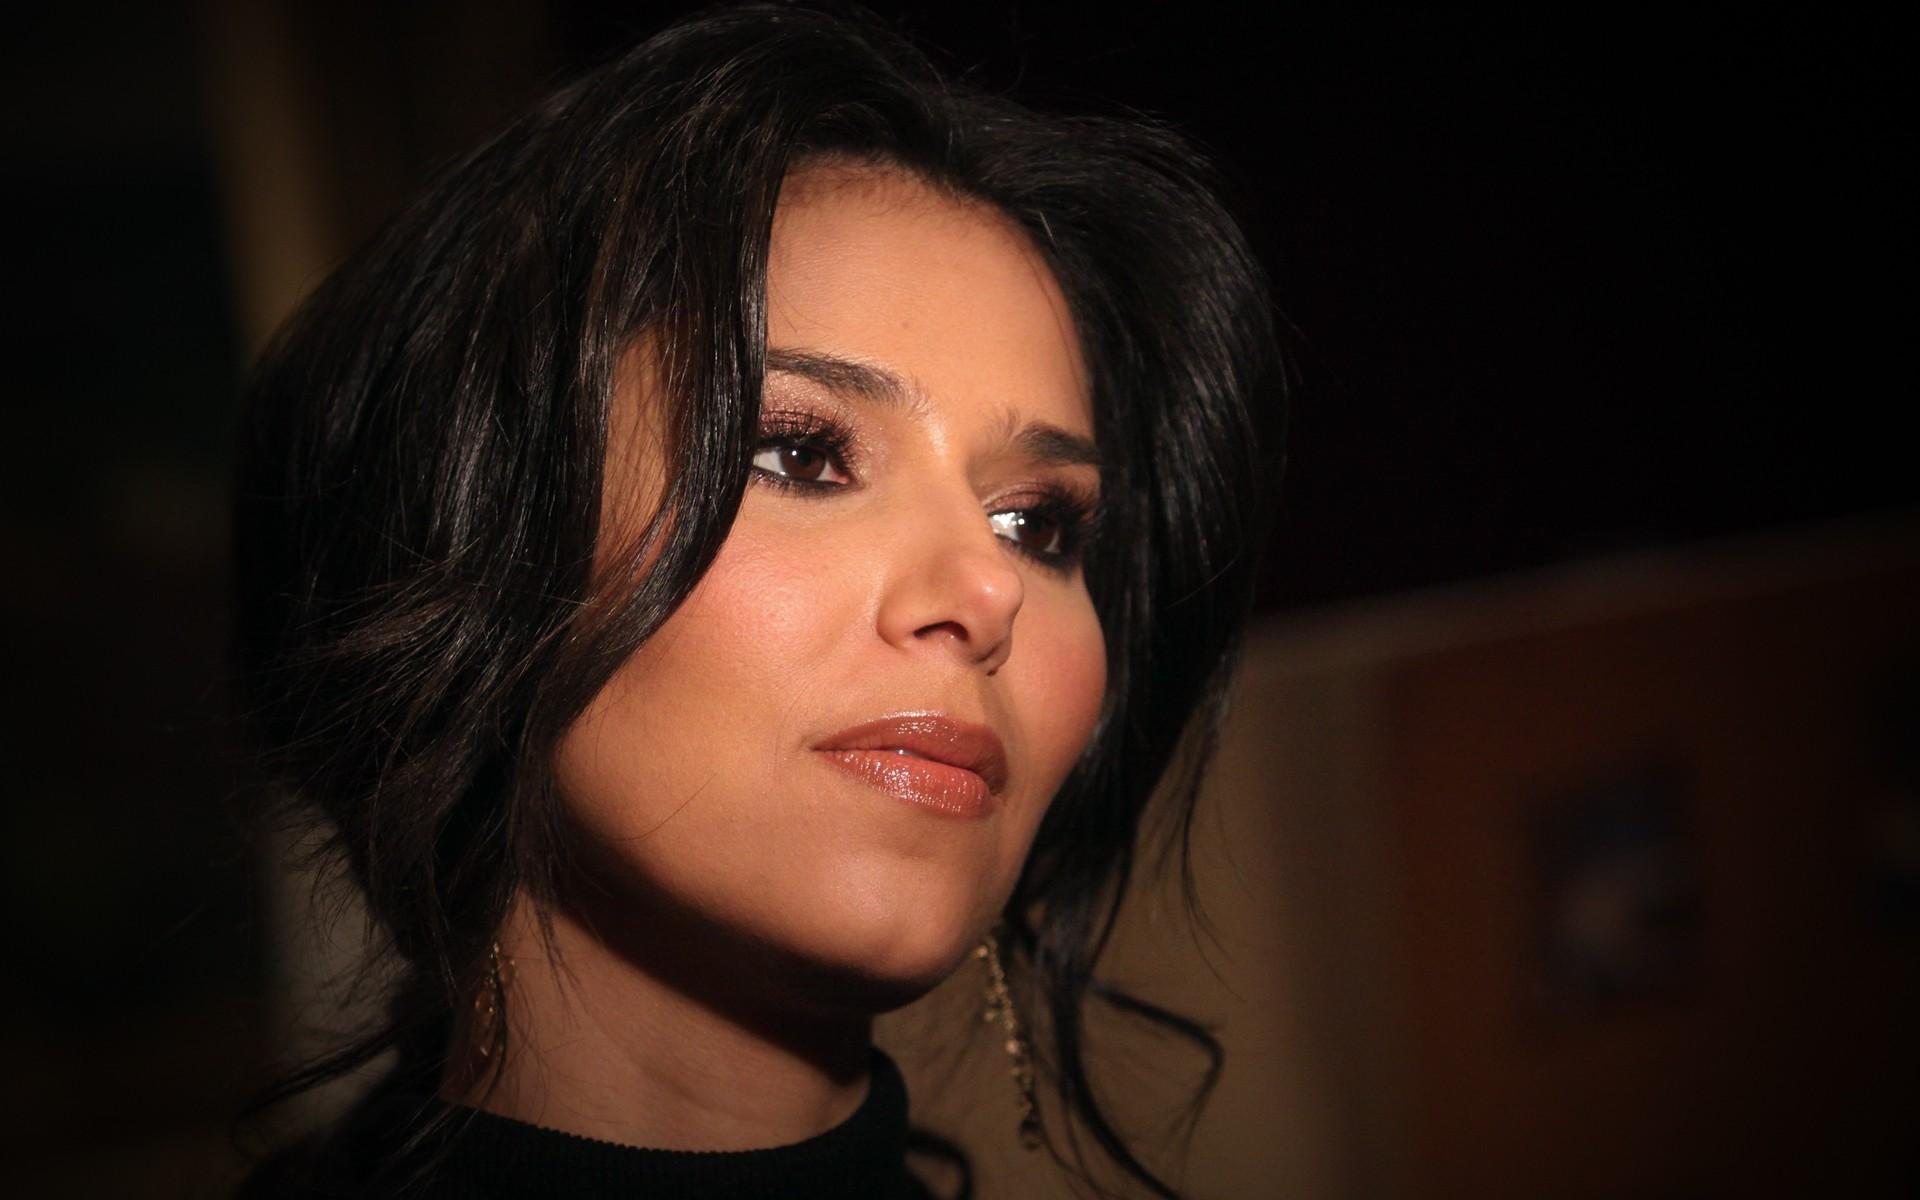 Rosalyn Sanchez rostro - 1920x1200